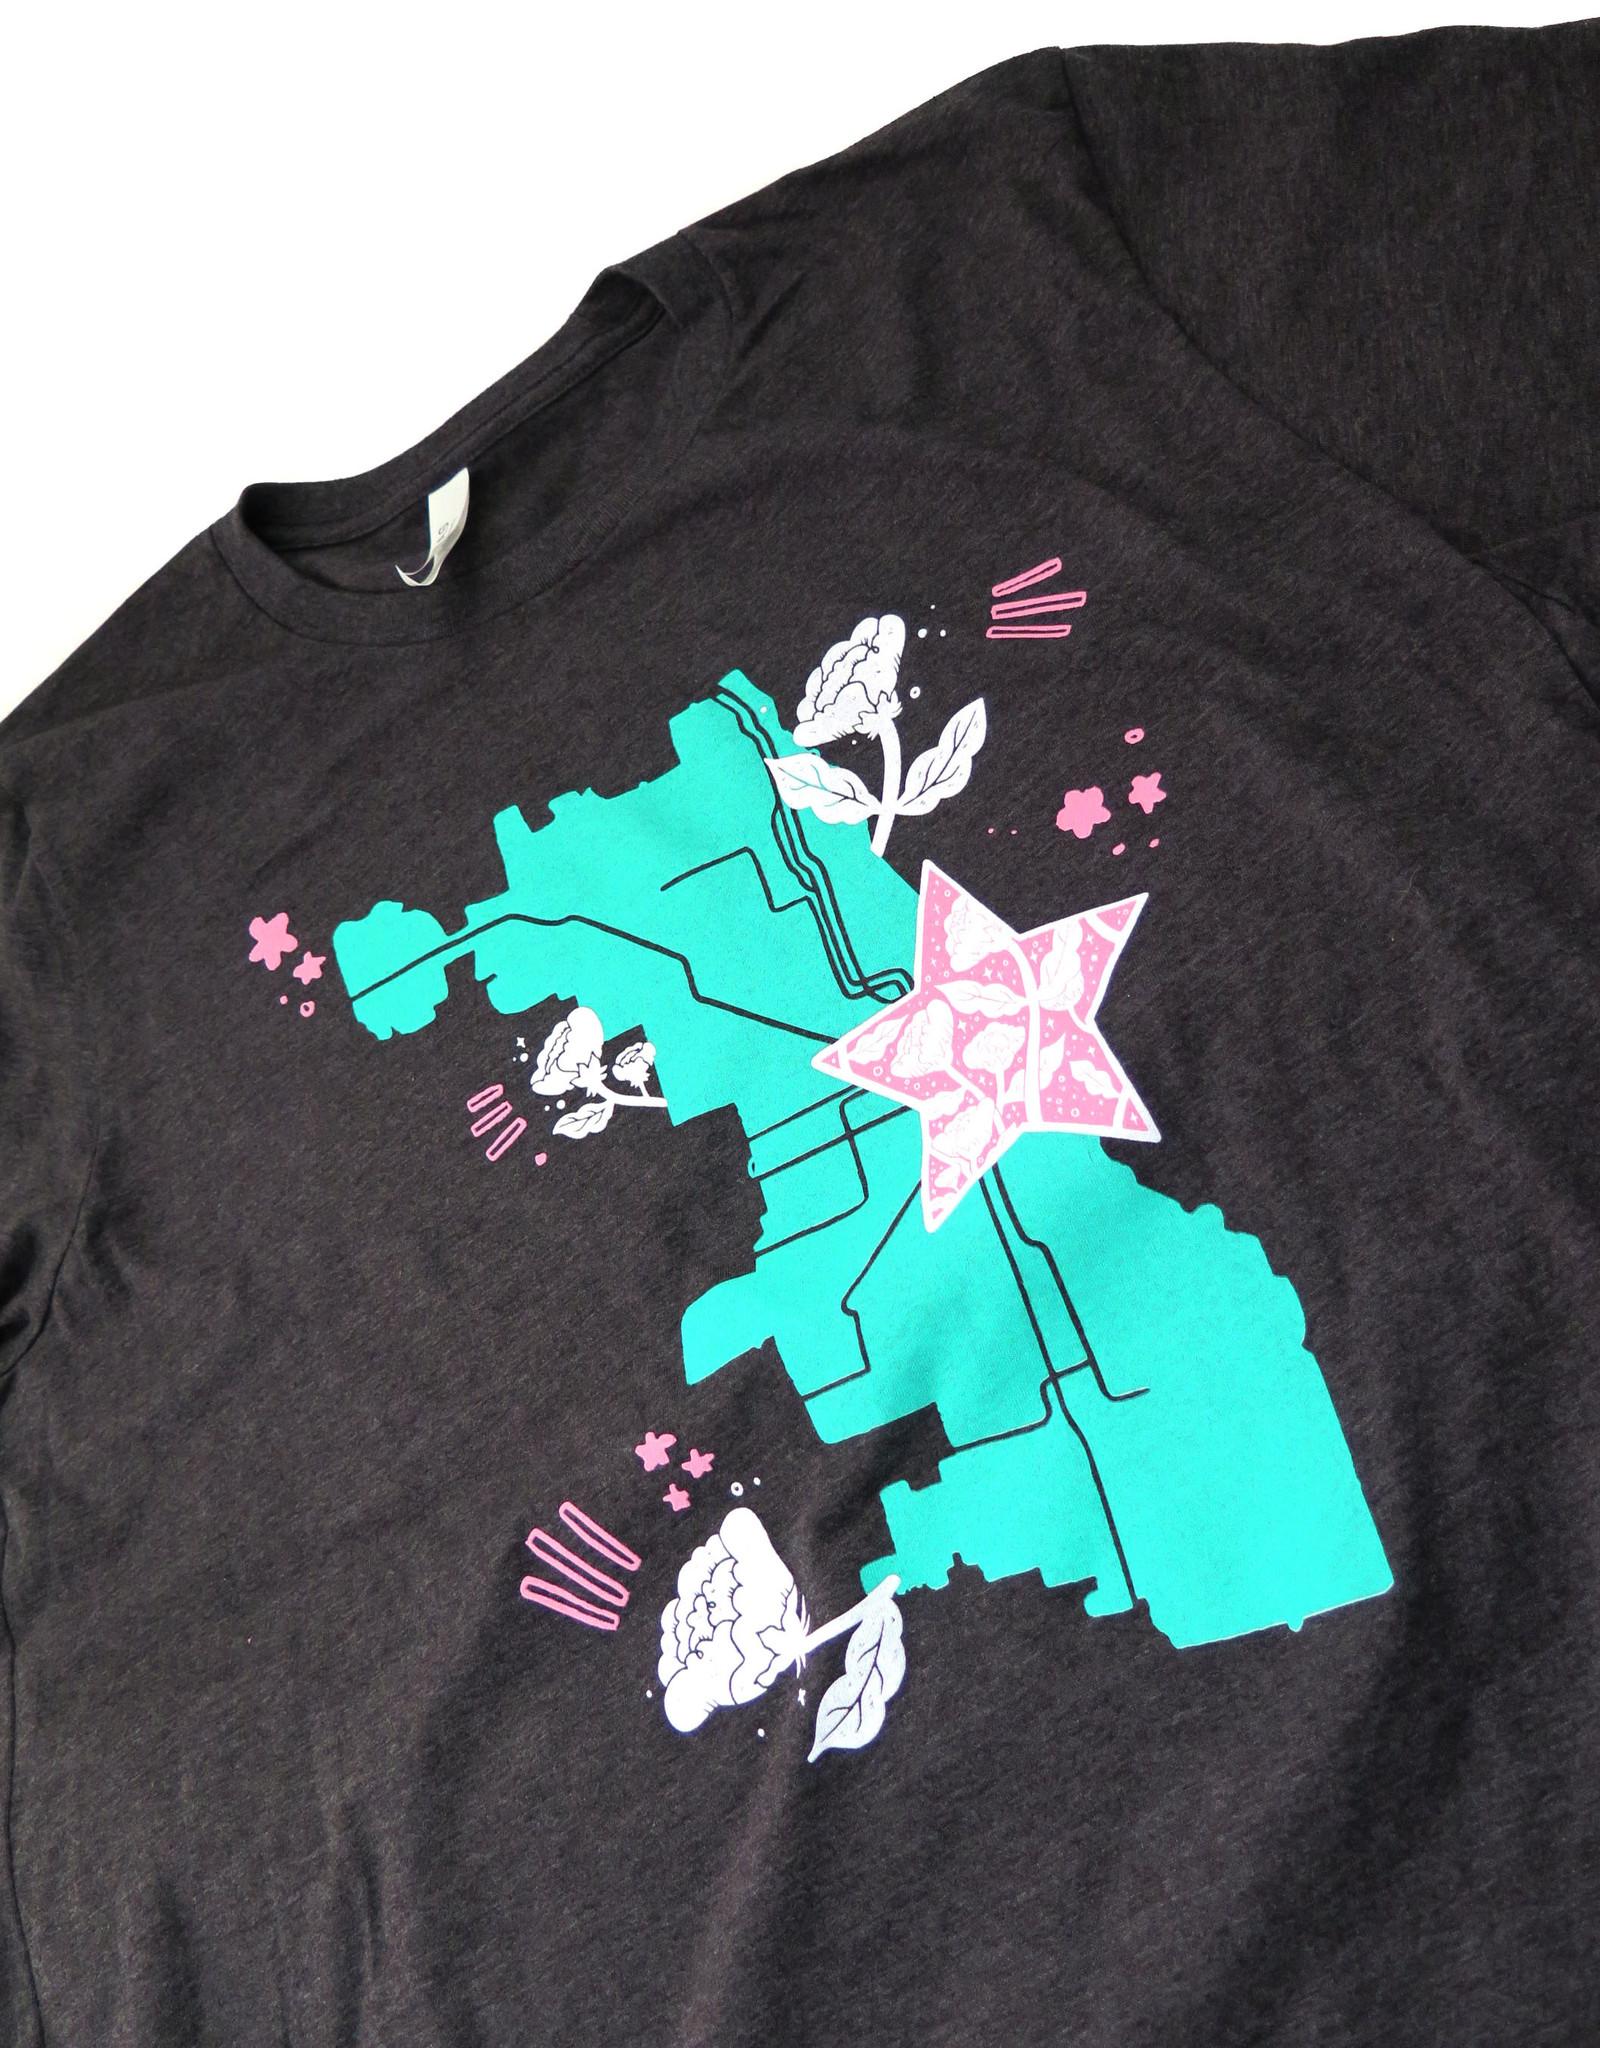 Manifest 2021 Tshirt